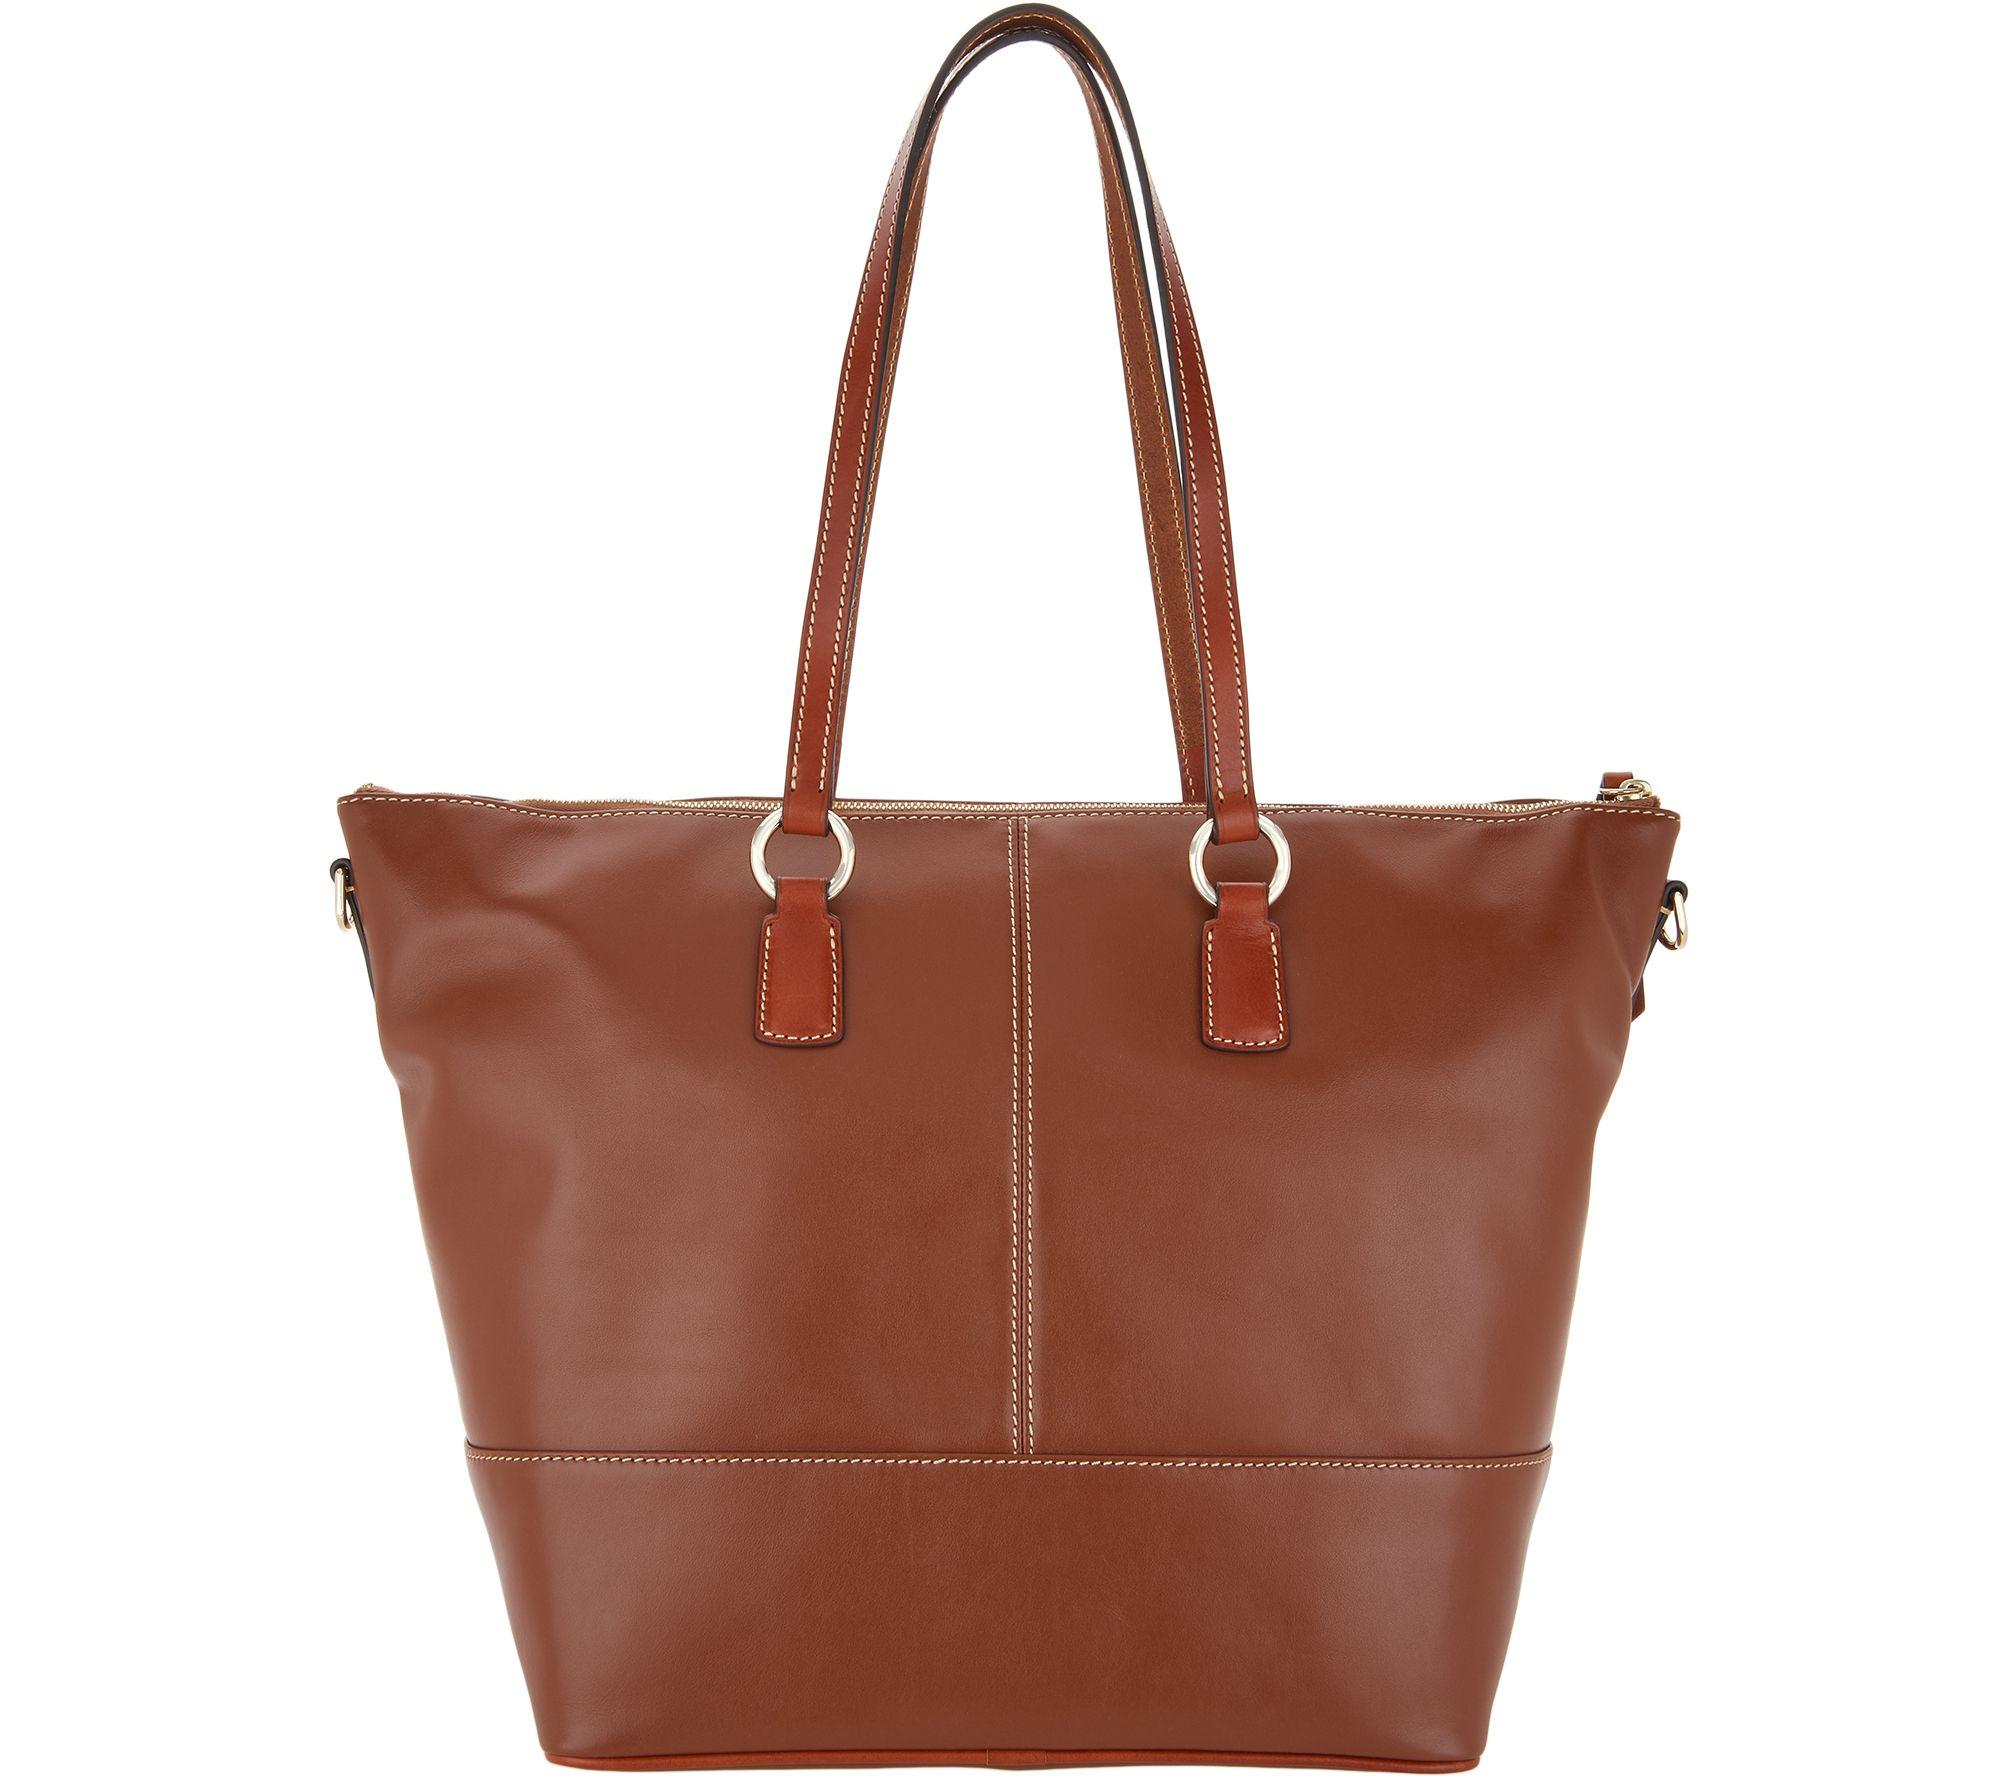 53a6b1da49 Dooney   Bourke Leather Becky Tote - Page 1 — QVC.com